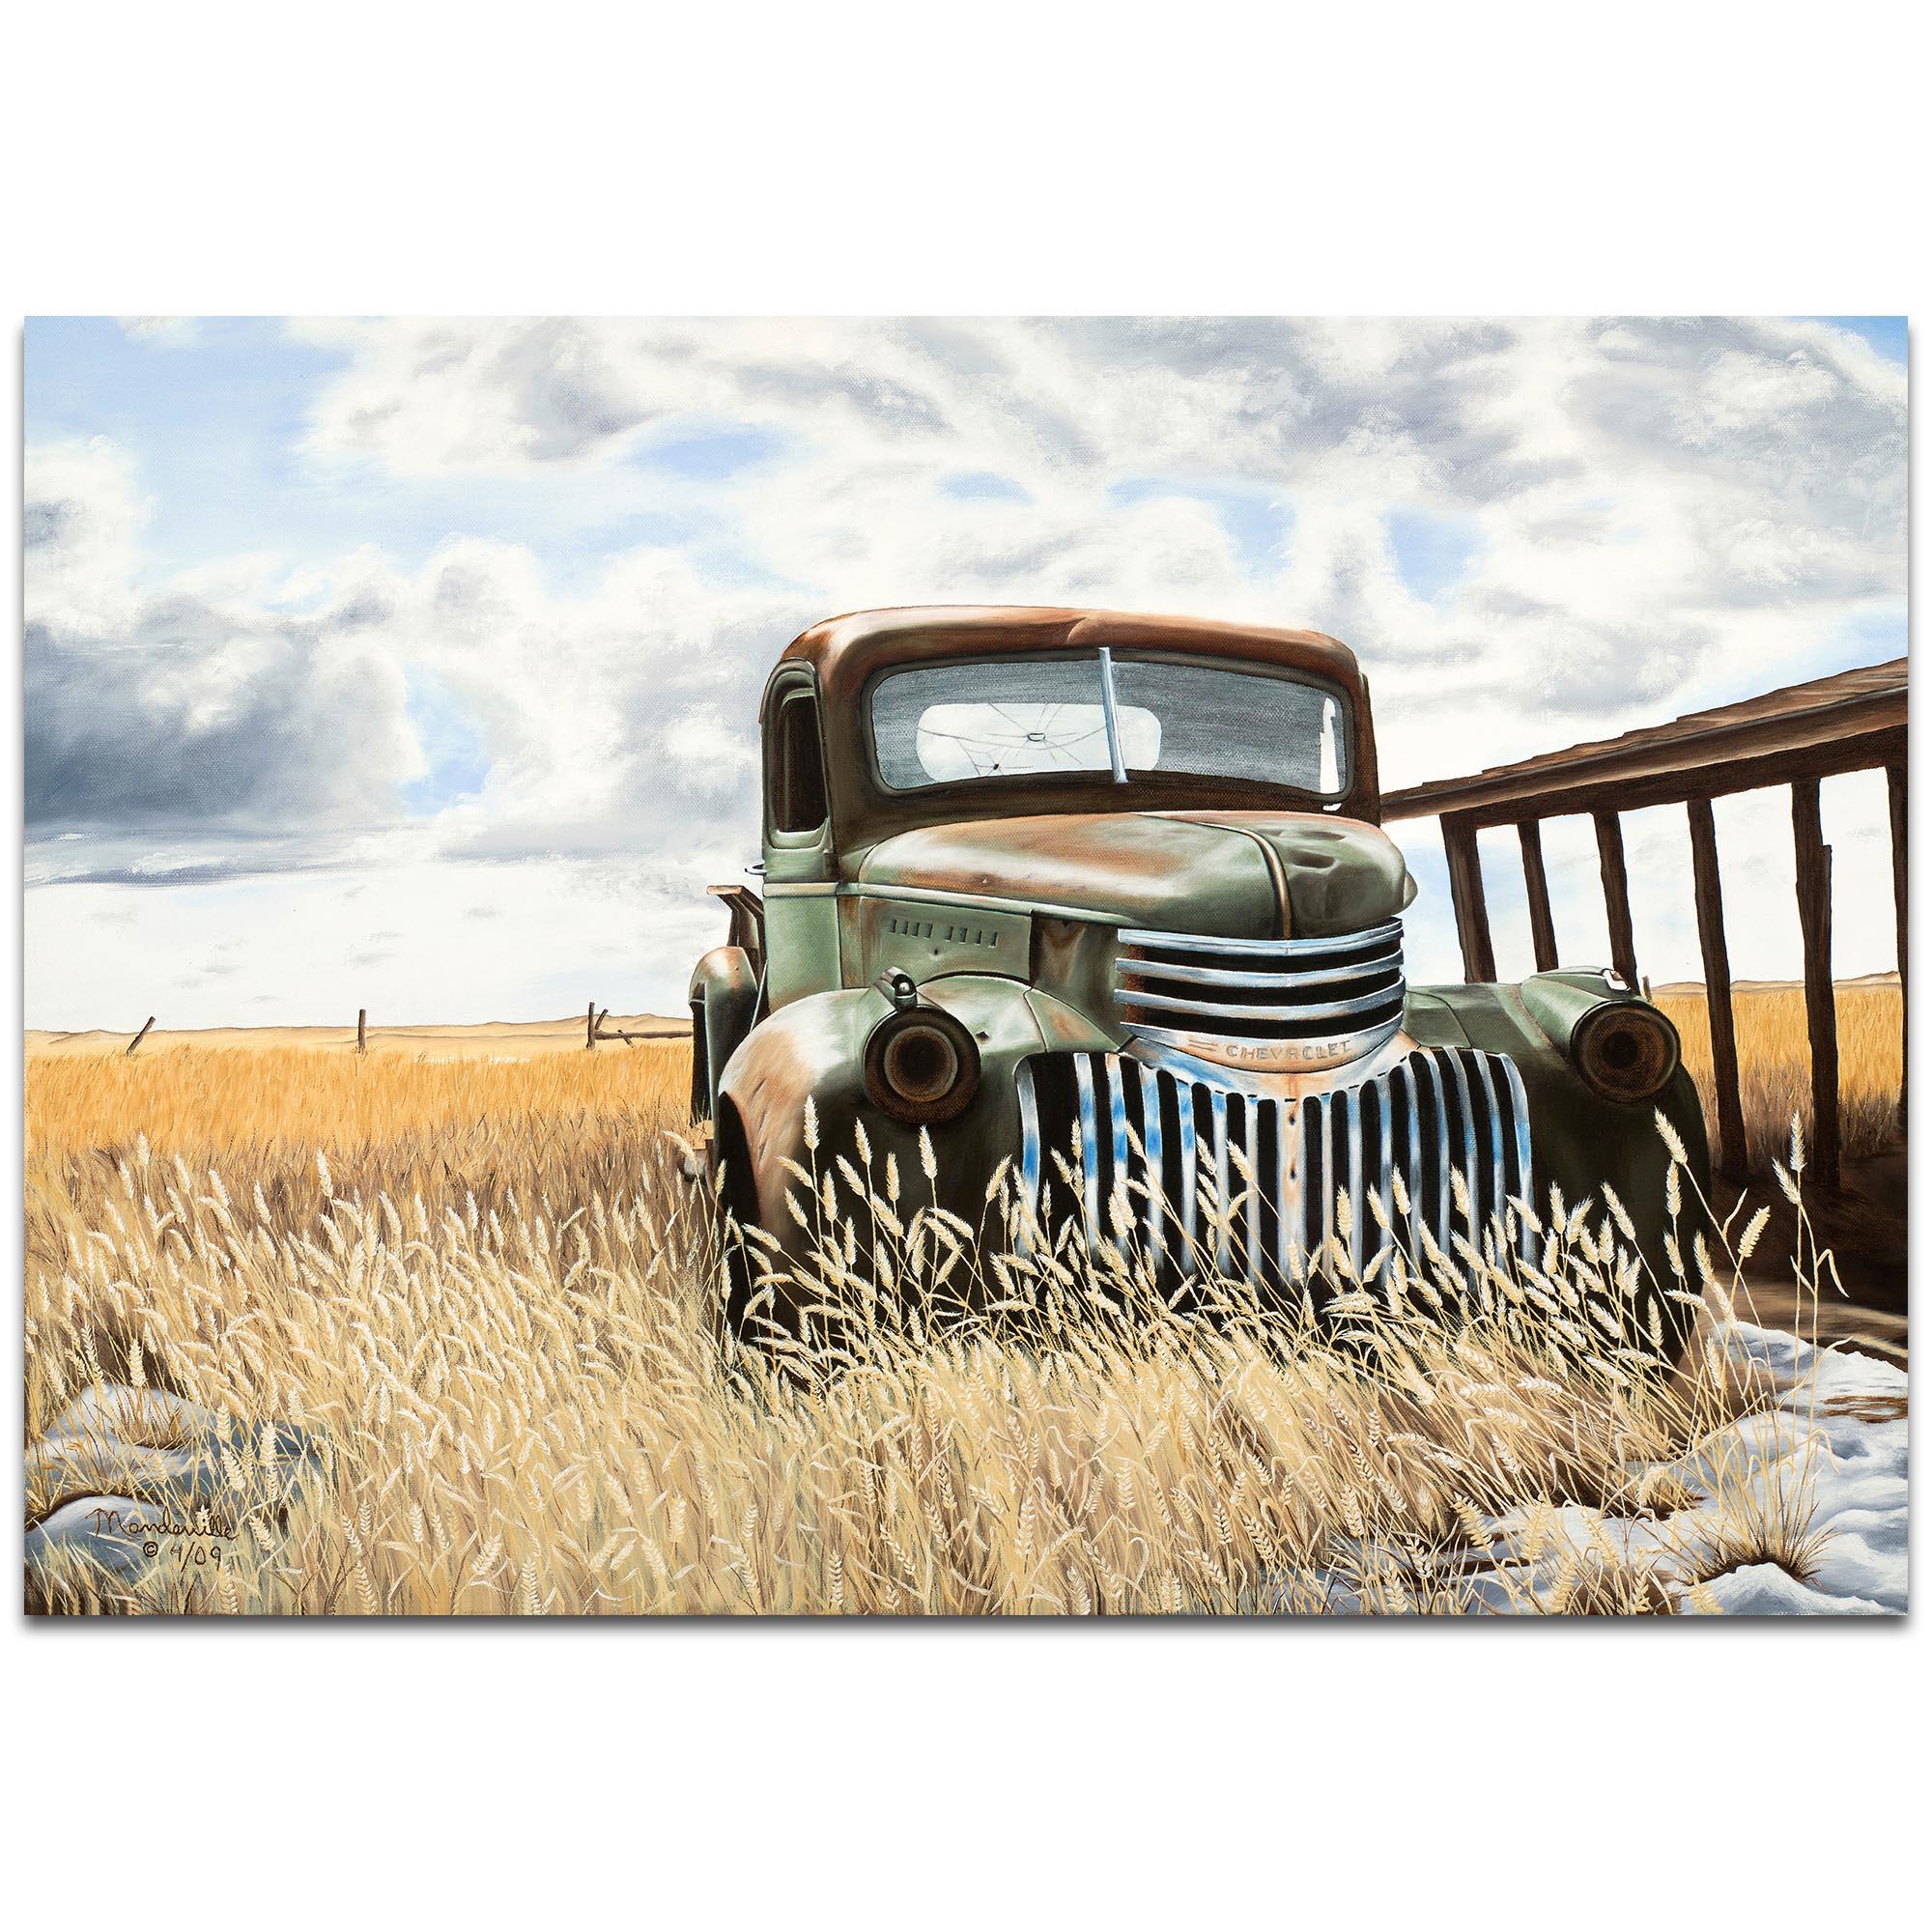 Americana Wall Art Swede S Old Truck Clic Trucks Decor On Metal Or Plexigl